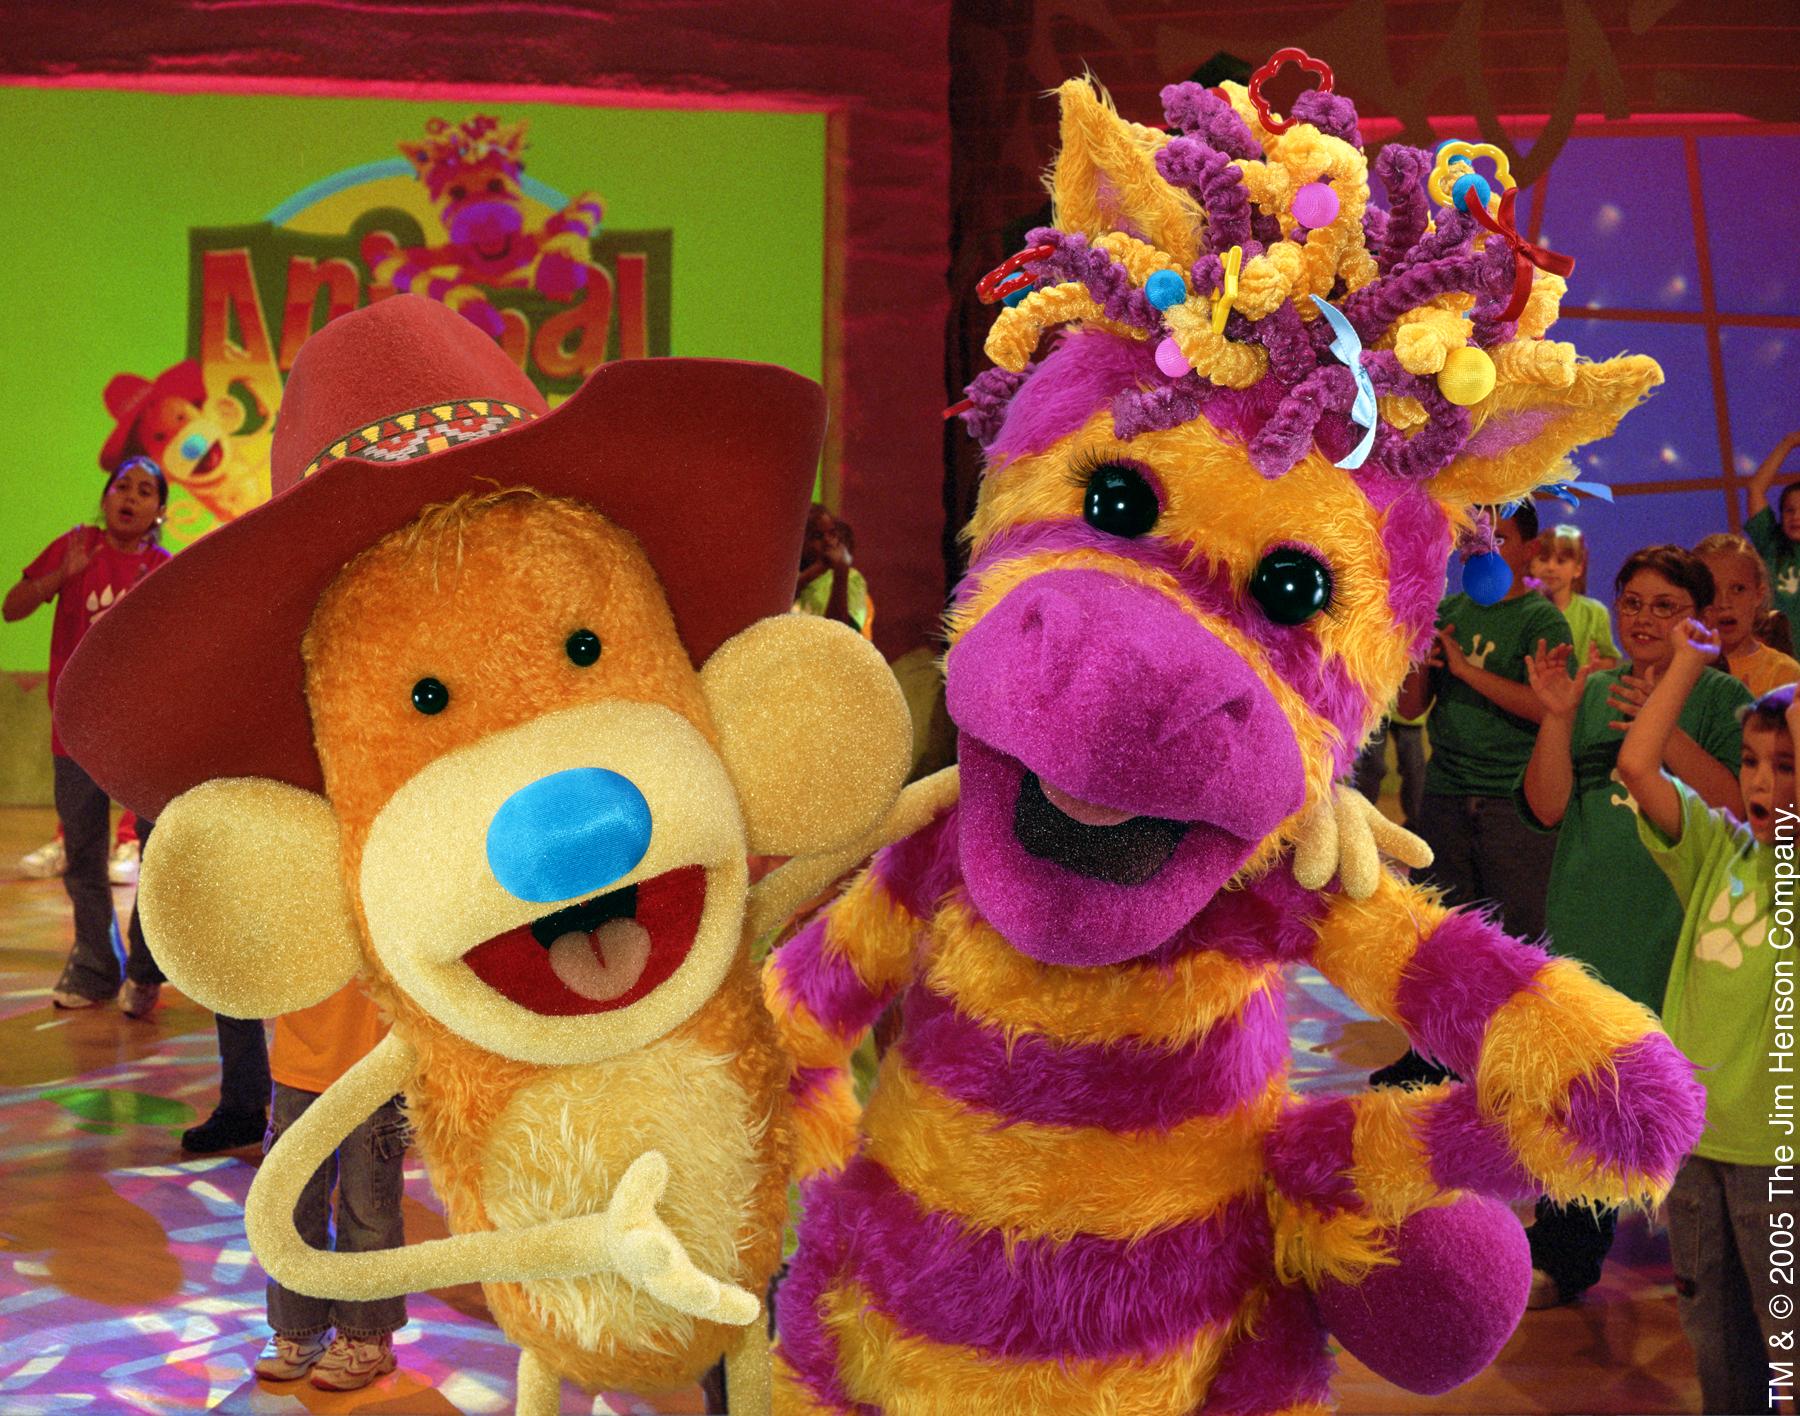 Anything Muppets - Muppet Wiki